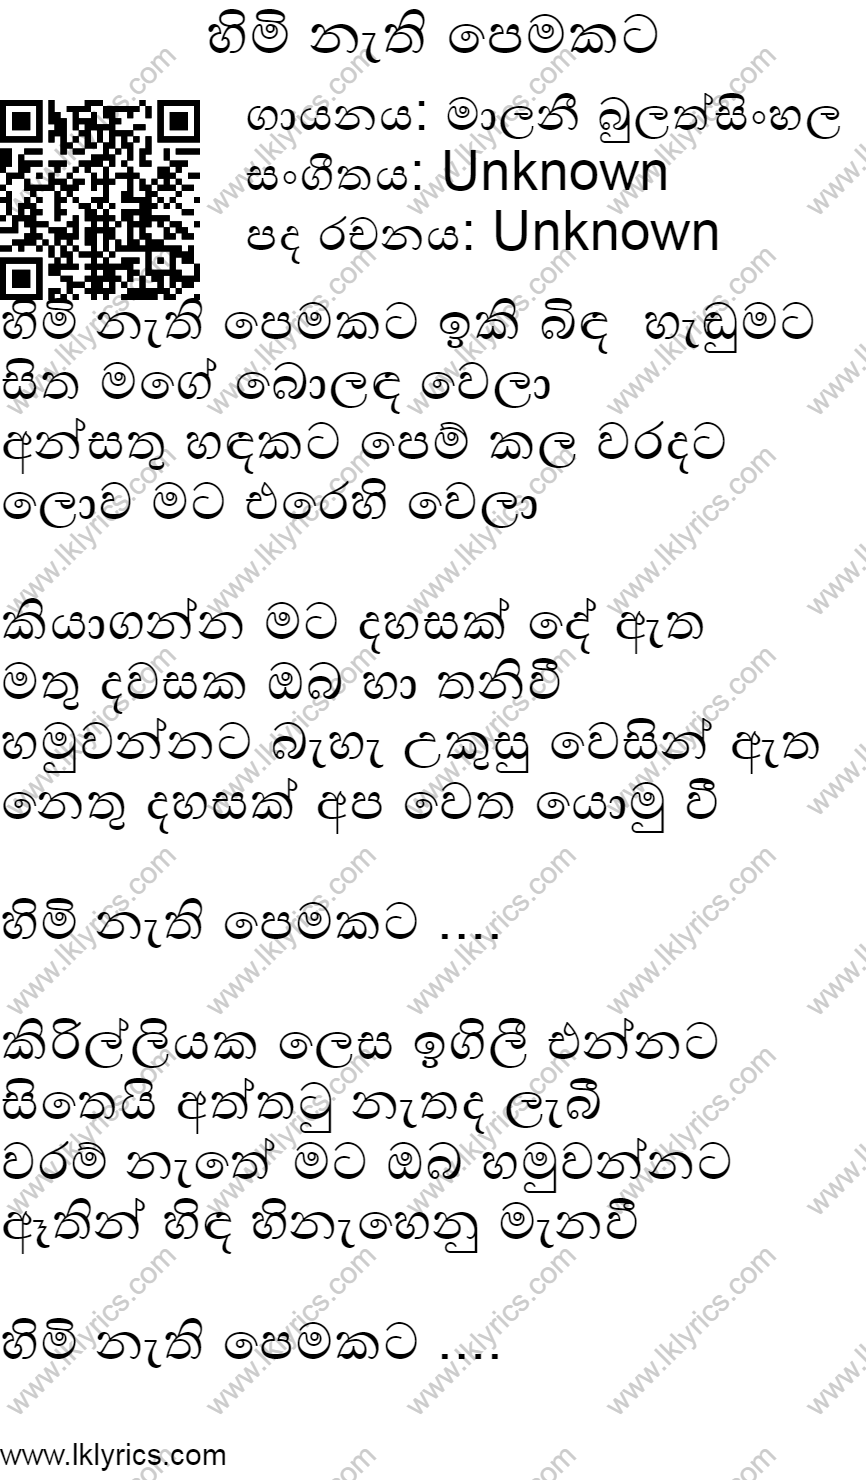 himi nathi pemakata mp3 song